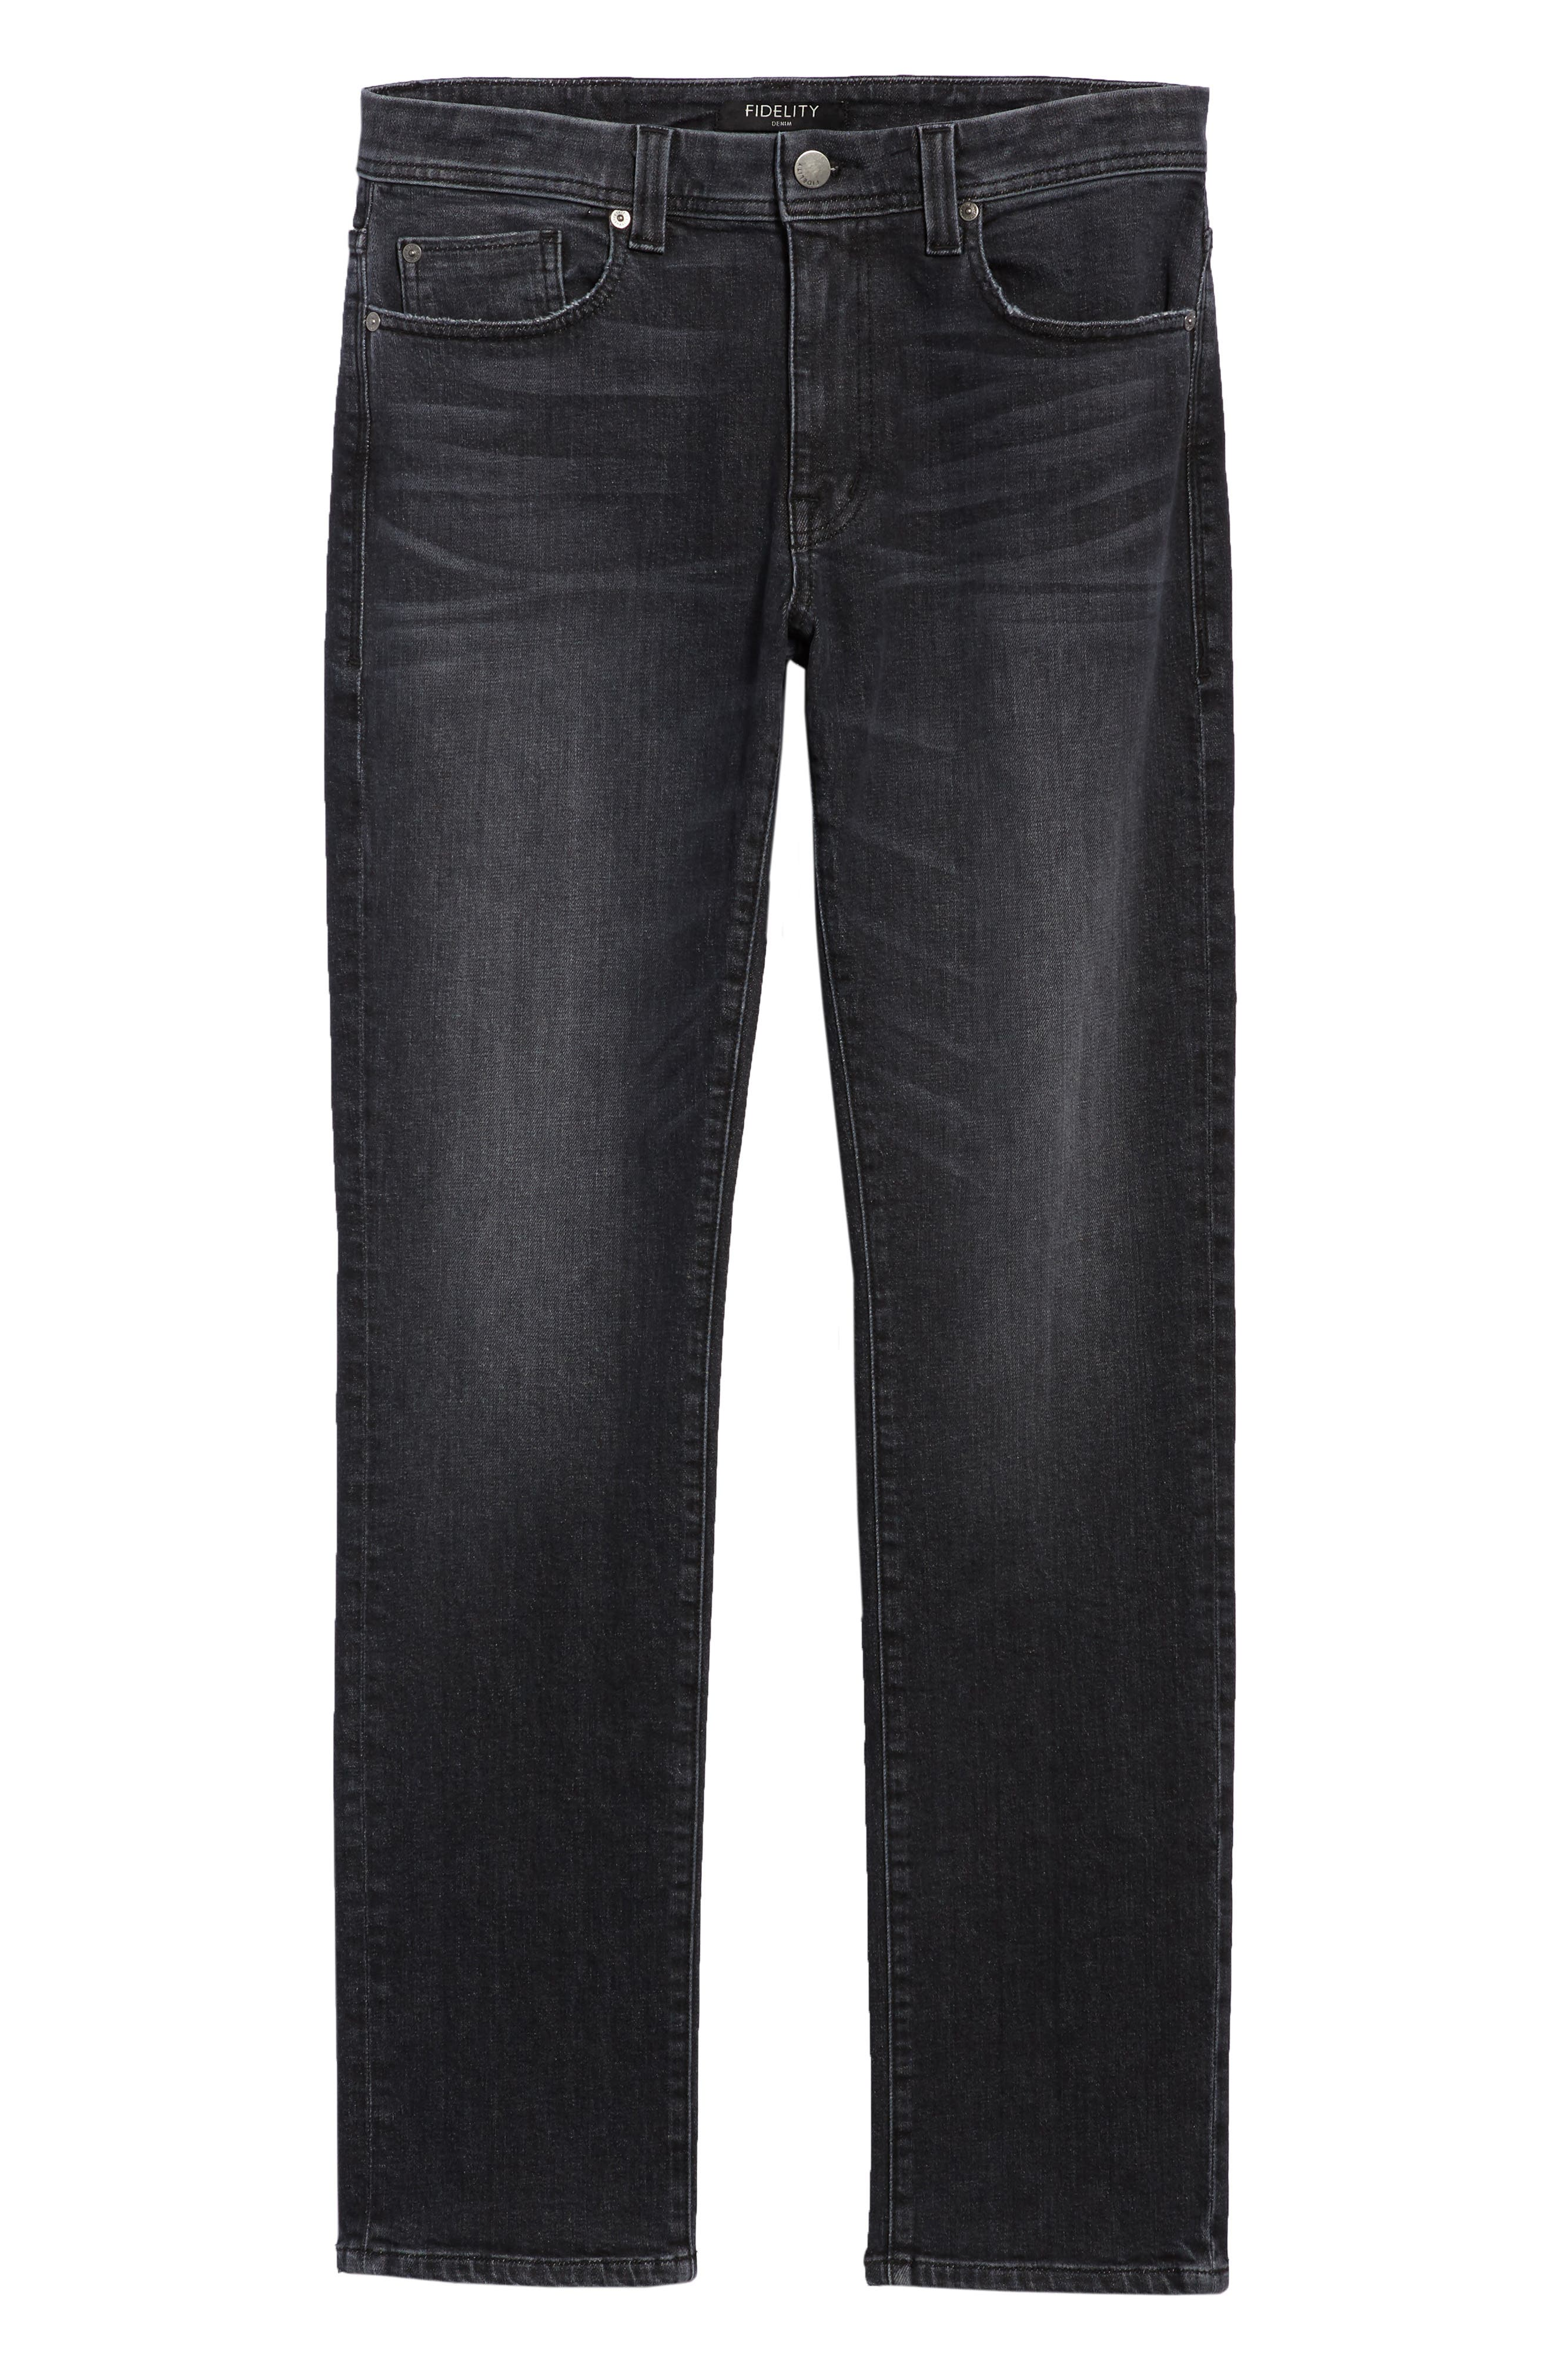 Jimmy Slim Straight Leg Jeans,                             Alternate thumbnail 6, color,                             RAVEN VINTAGE